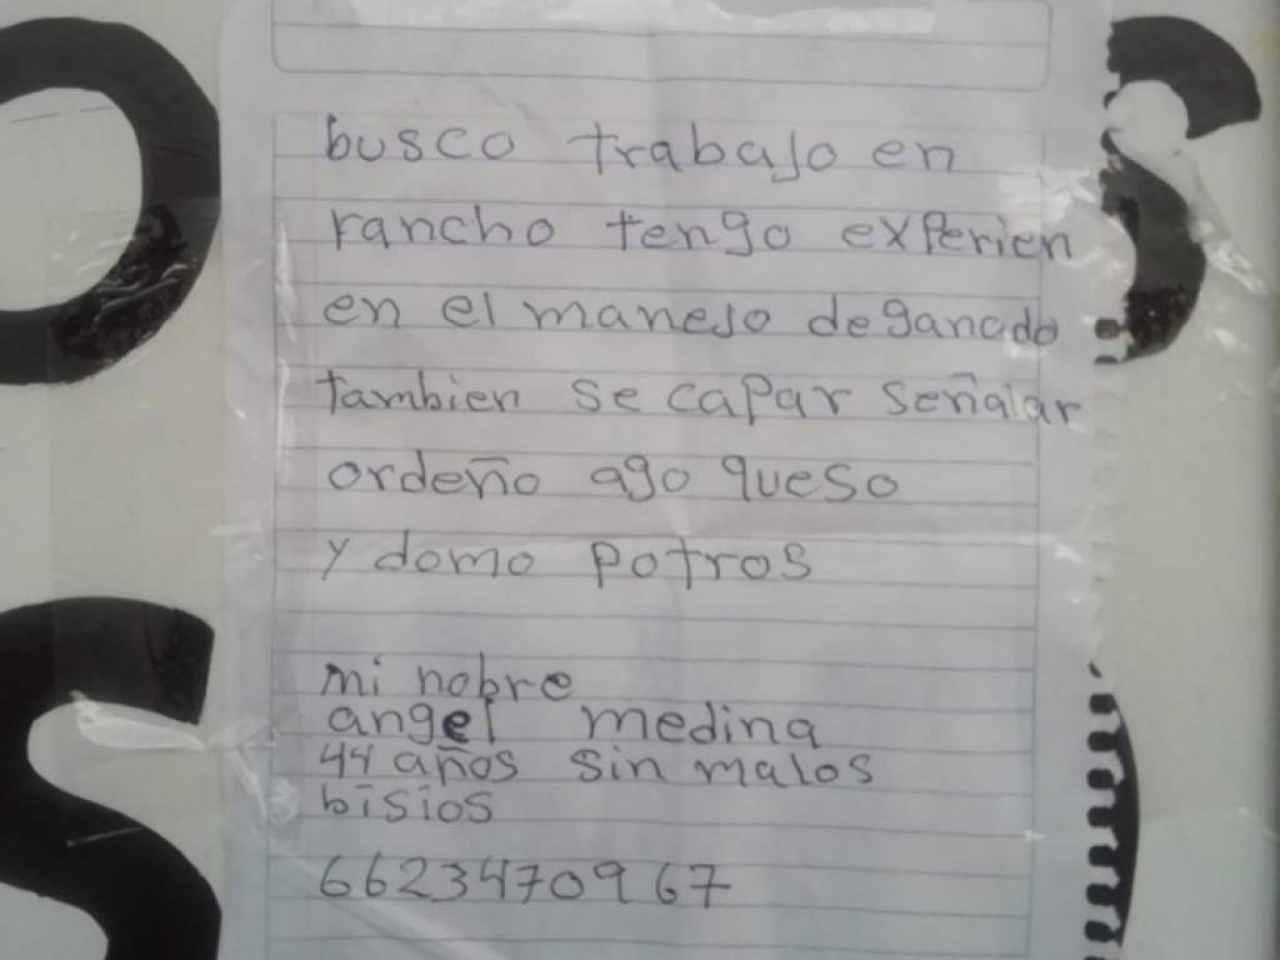 Currículum a mano de Ángel Medina